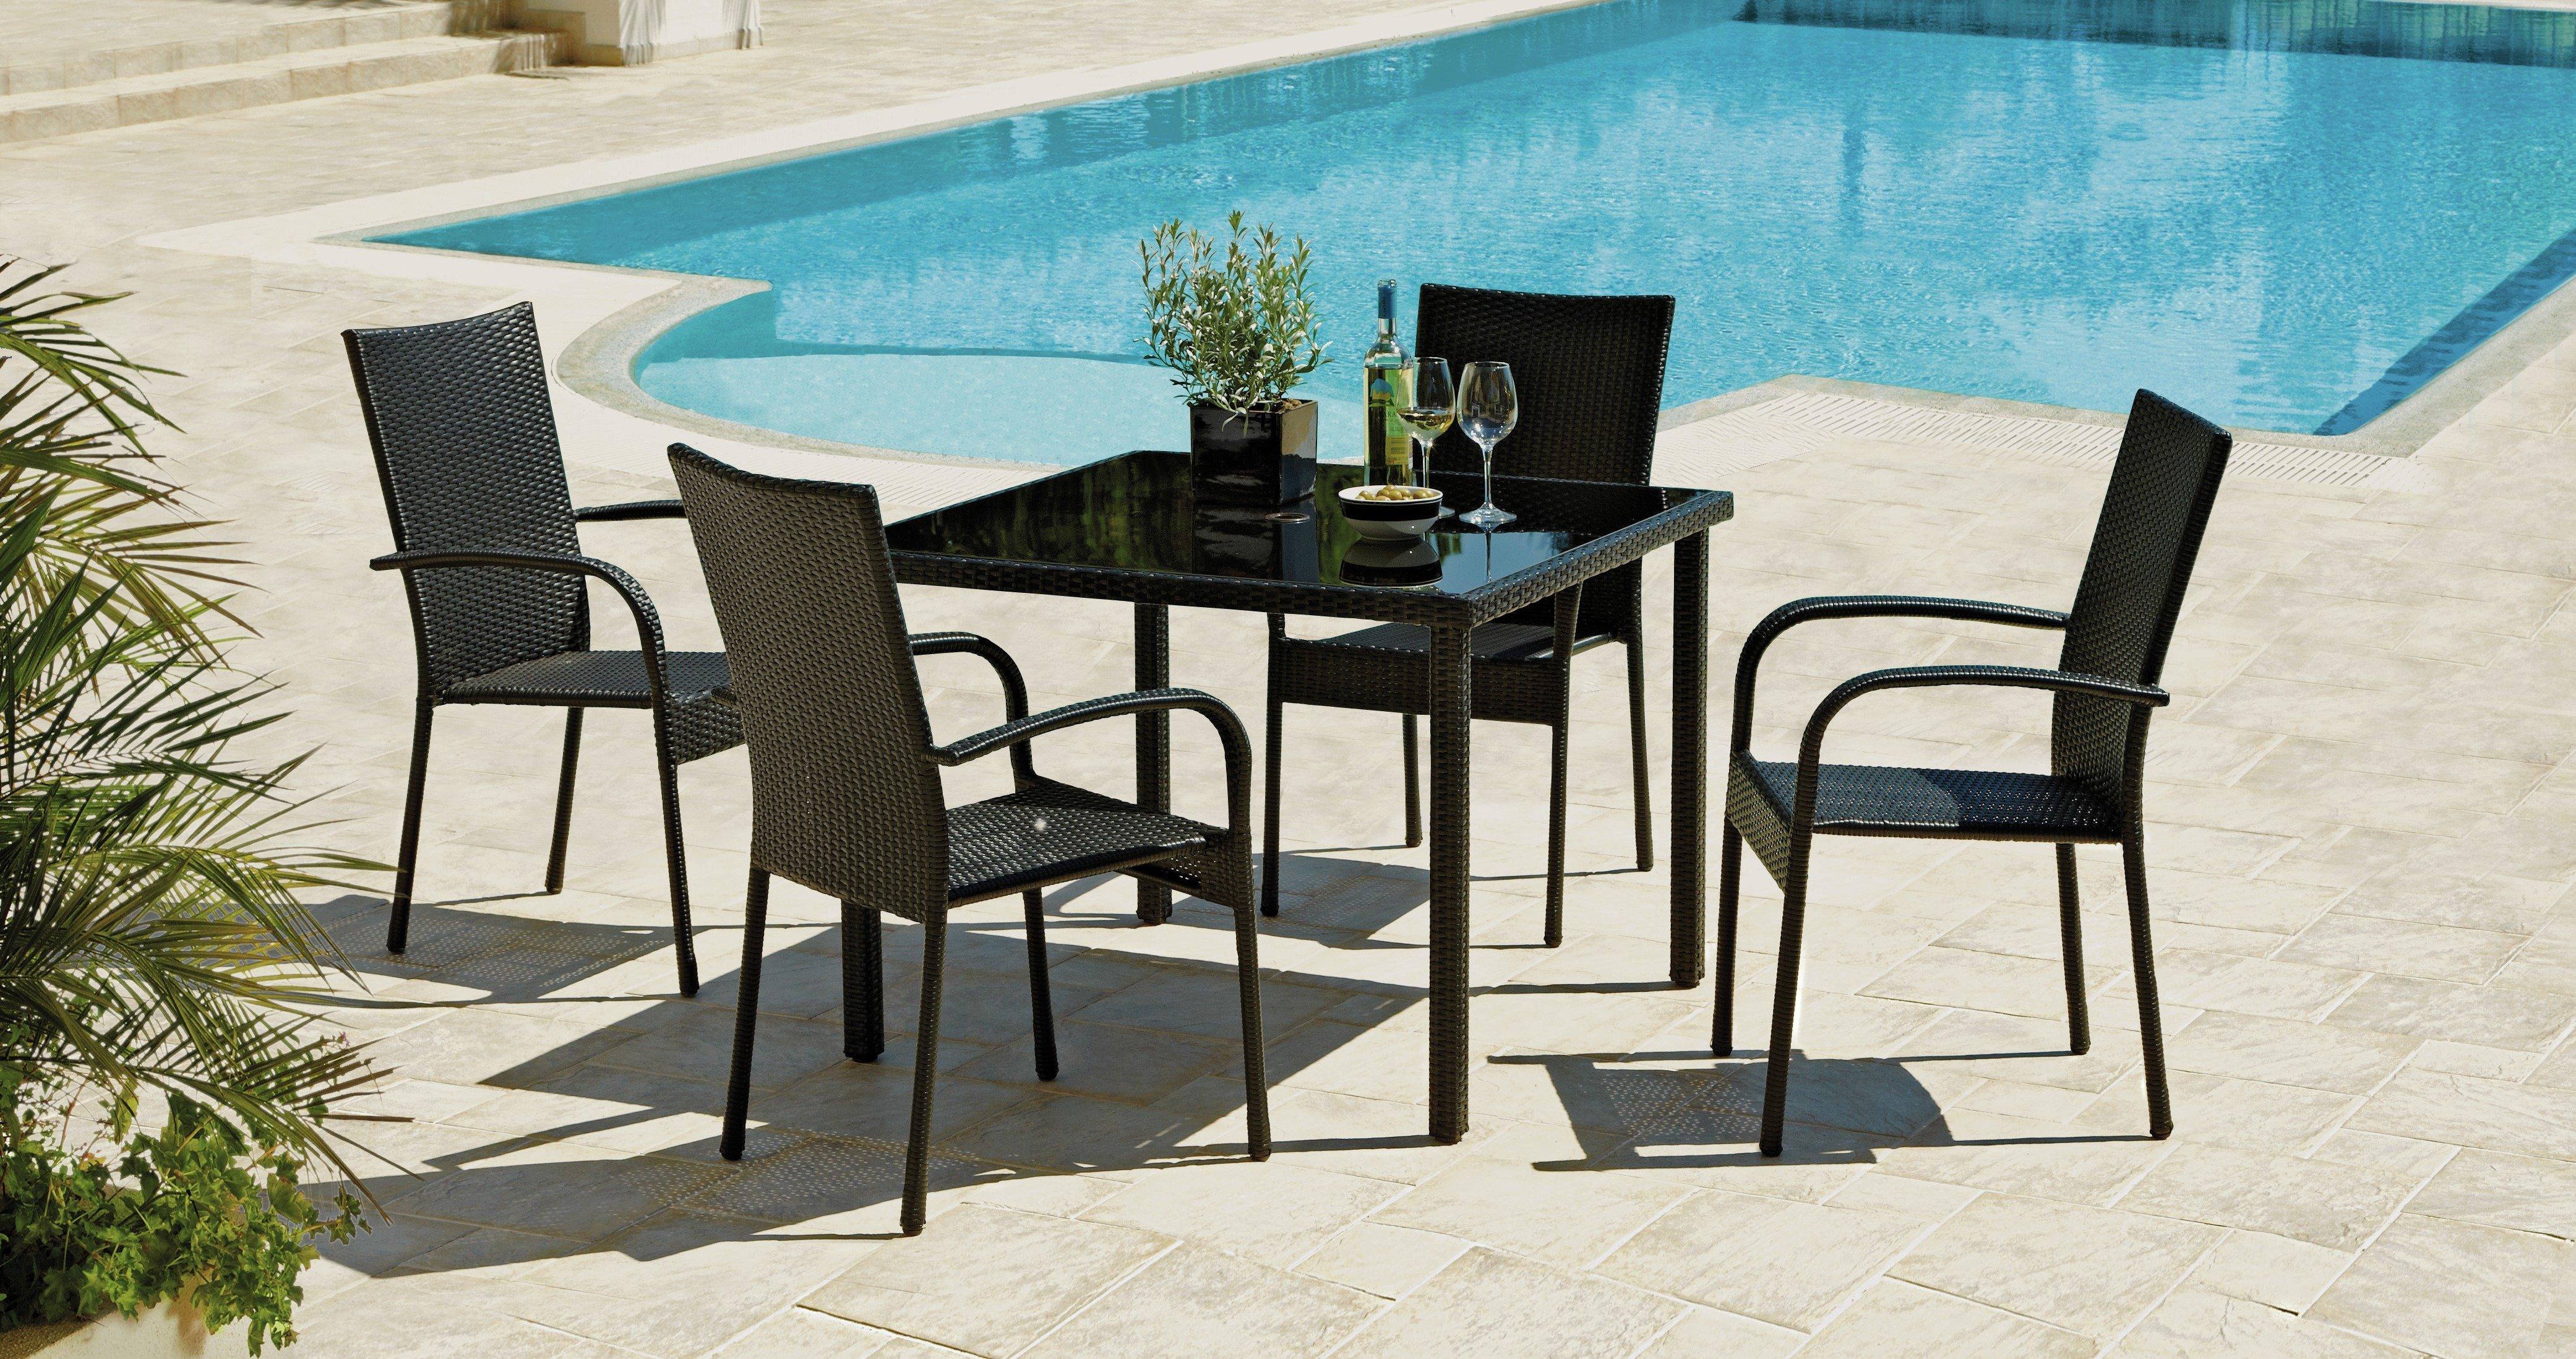 Buy Lima Rattan Effect 4 Seater Patio Furniture Dining Set Black